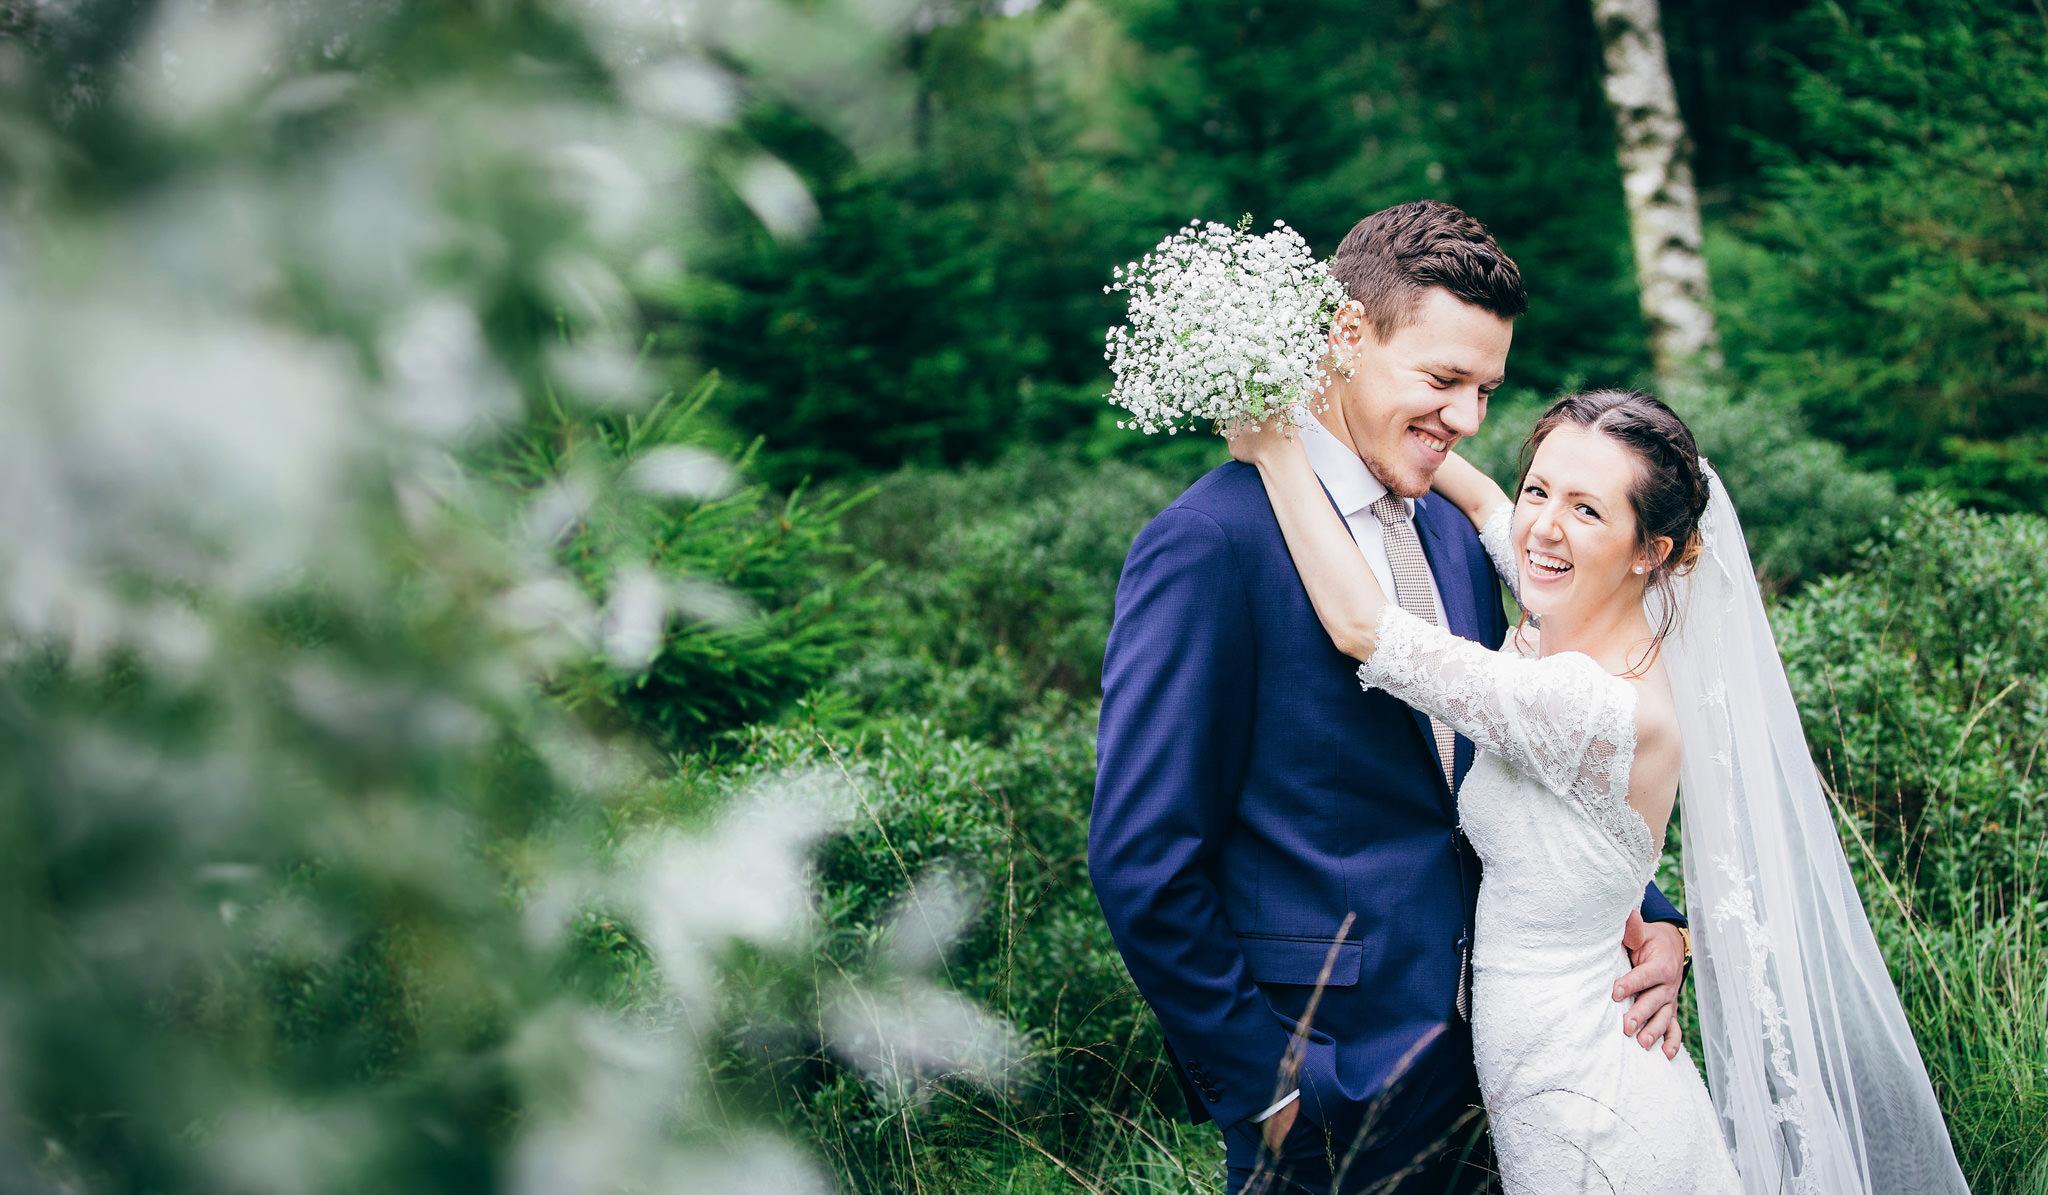 Norway+wedding+photographer+elopement+pre+wedding+Casey+Arneson-59.jpg